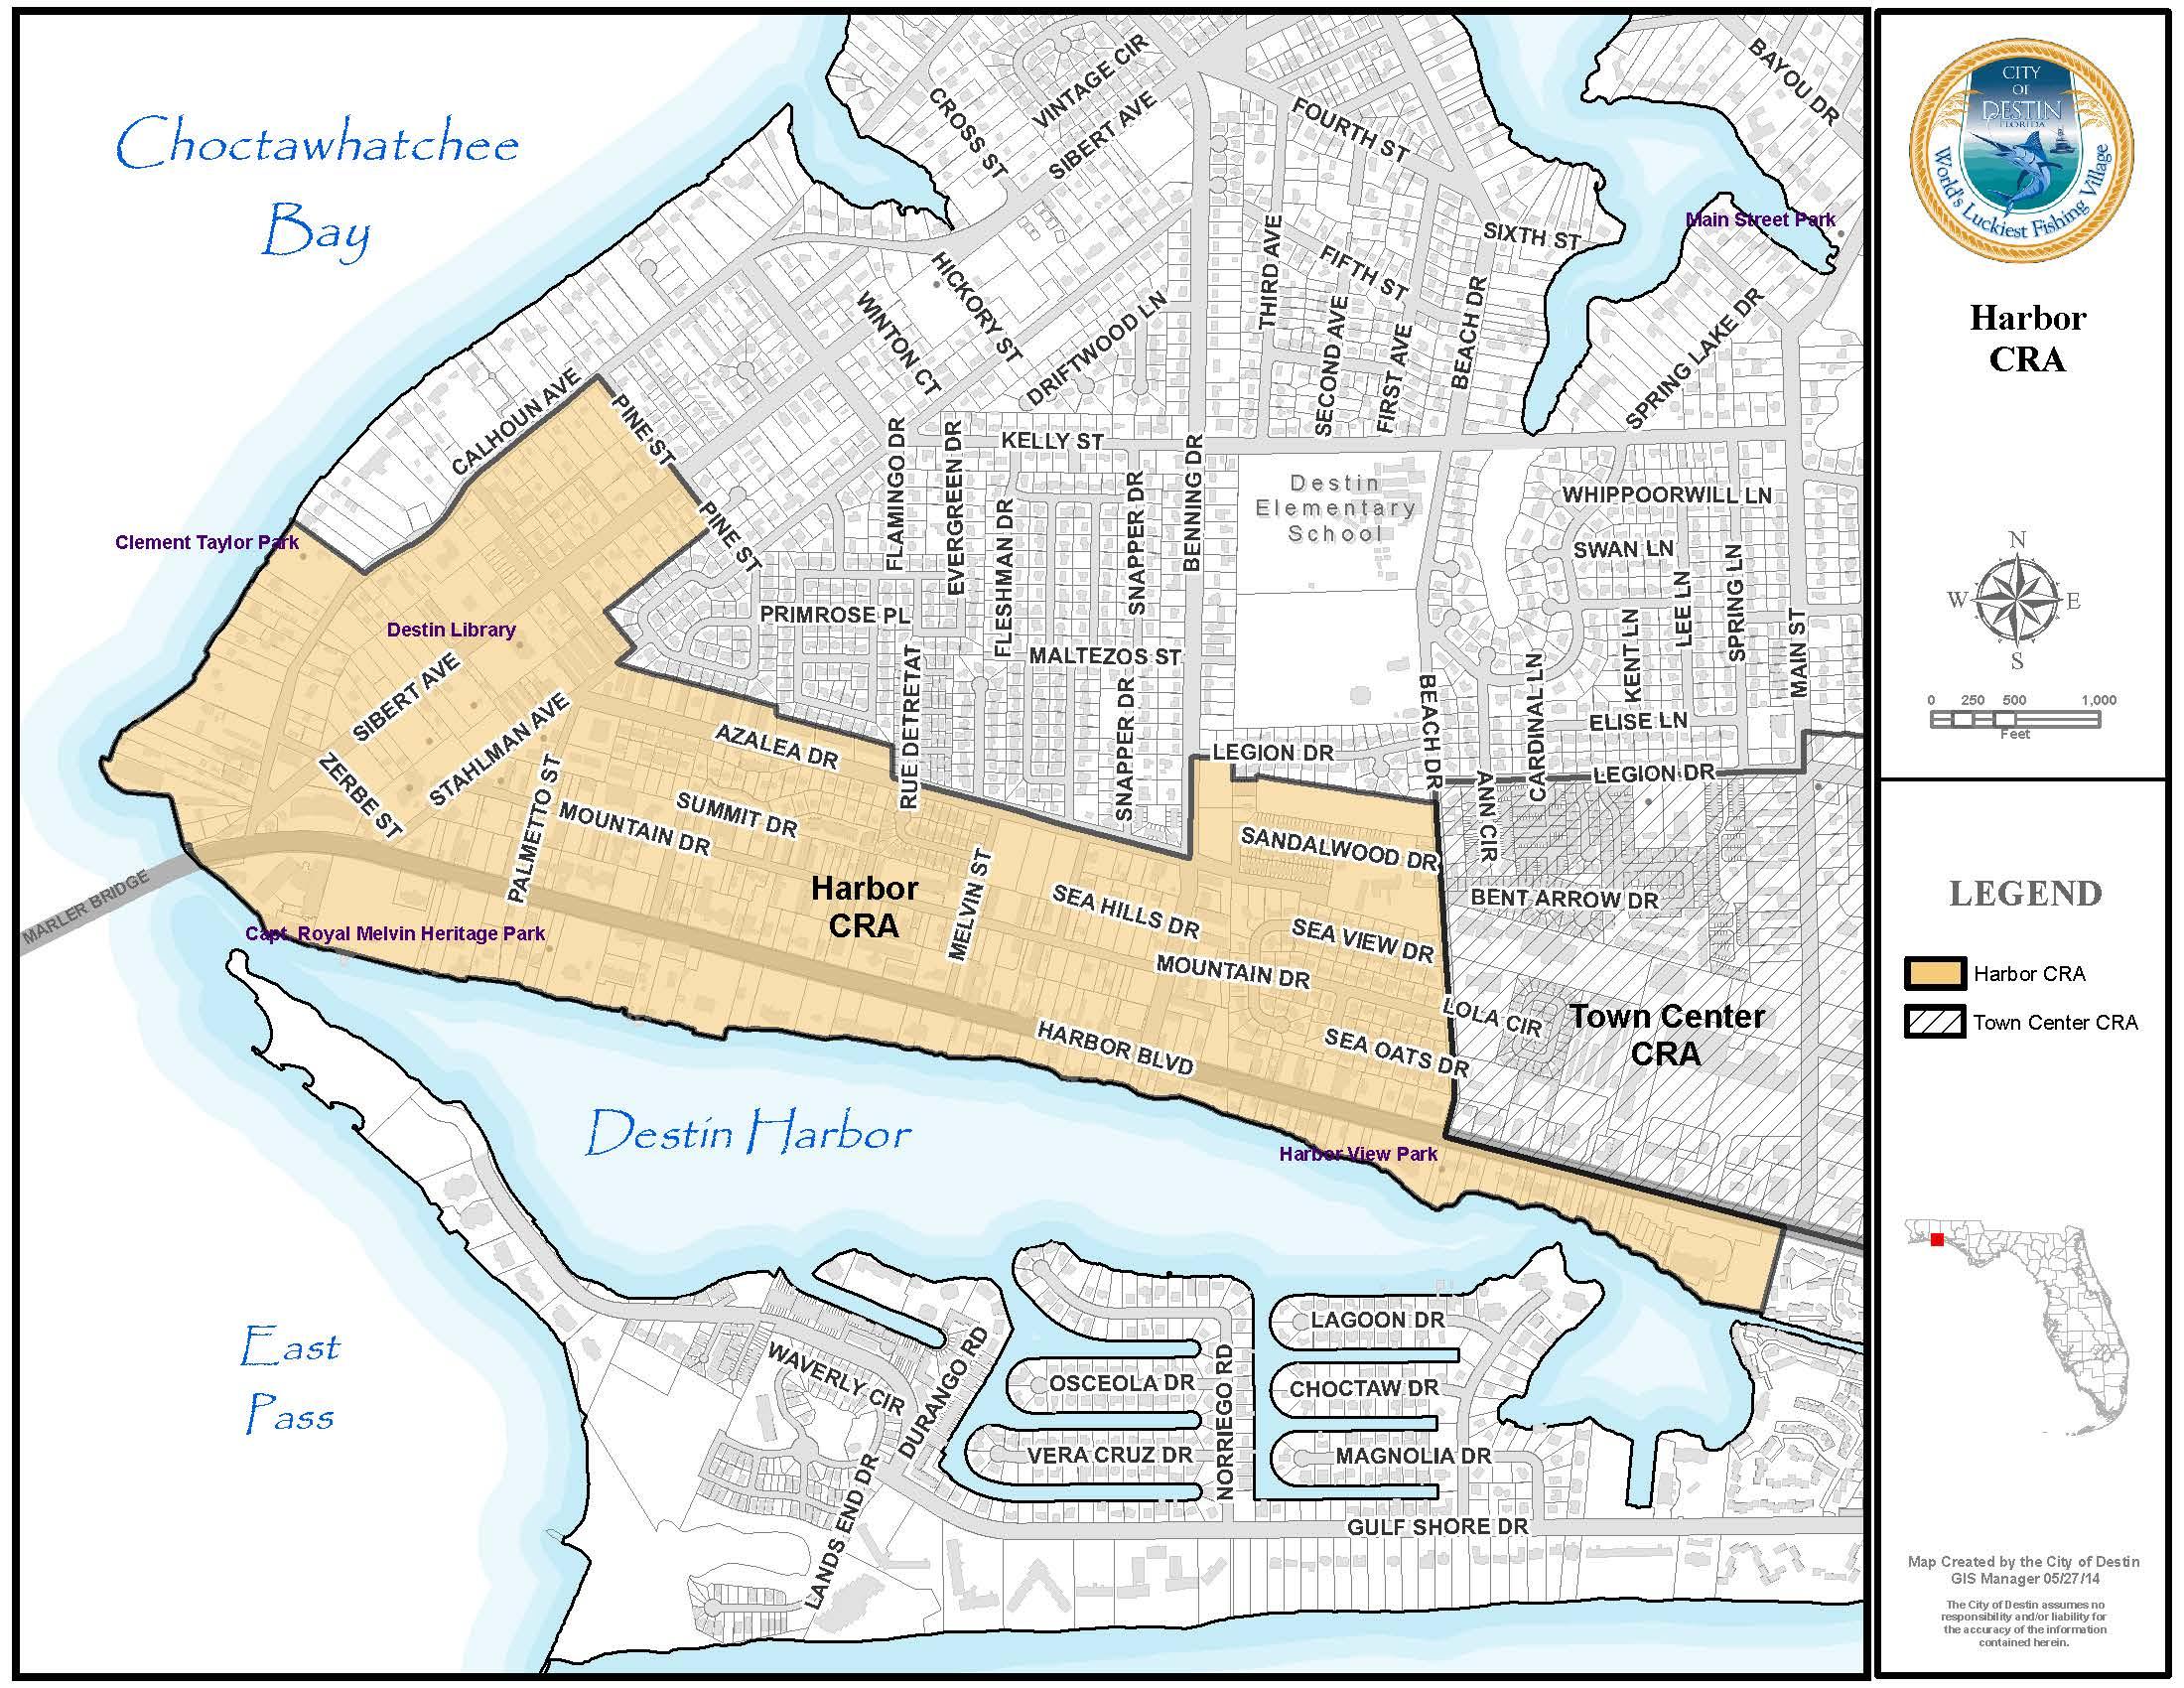 Harbor CRA   Destin, FL - Official Website